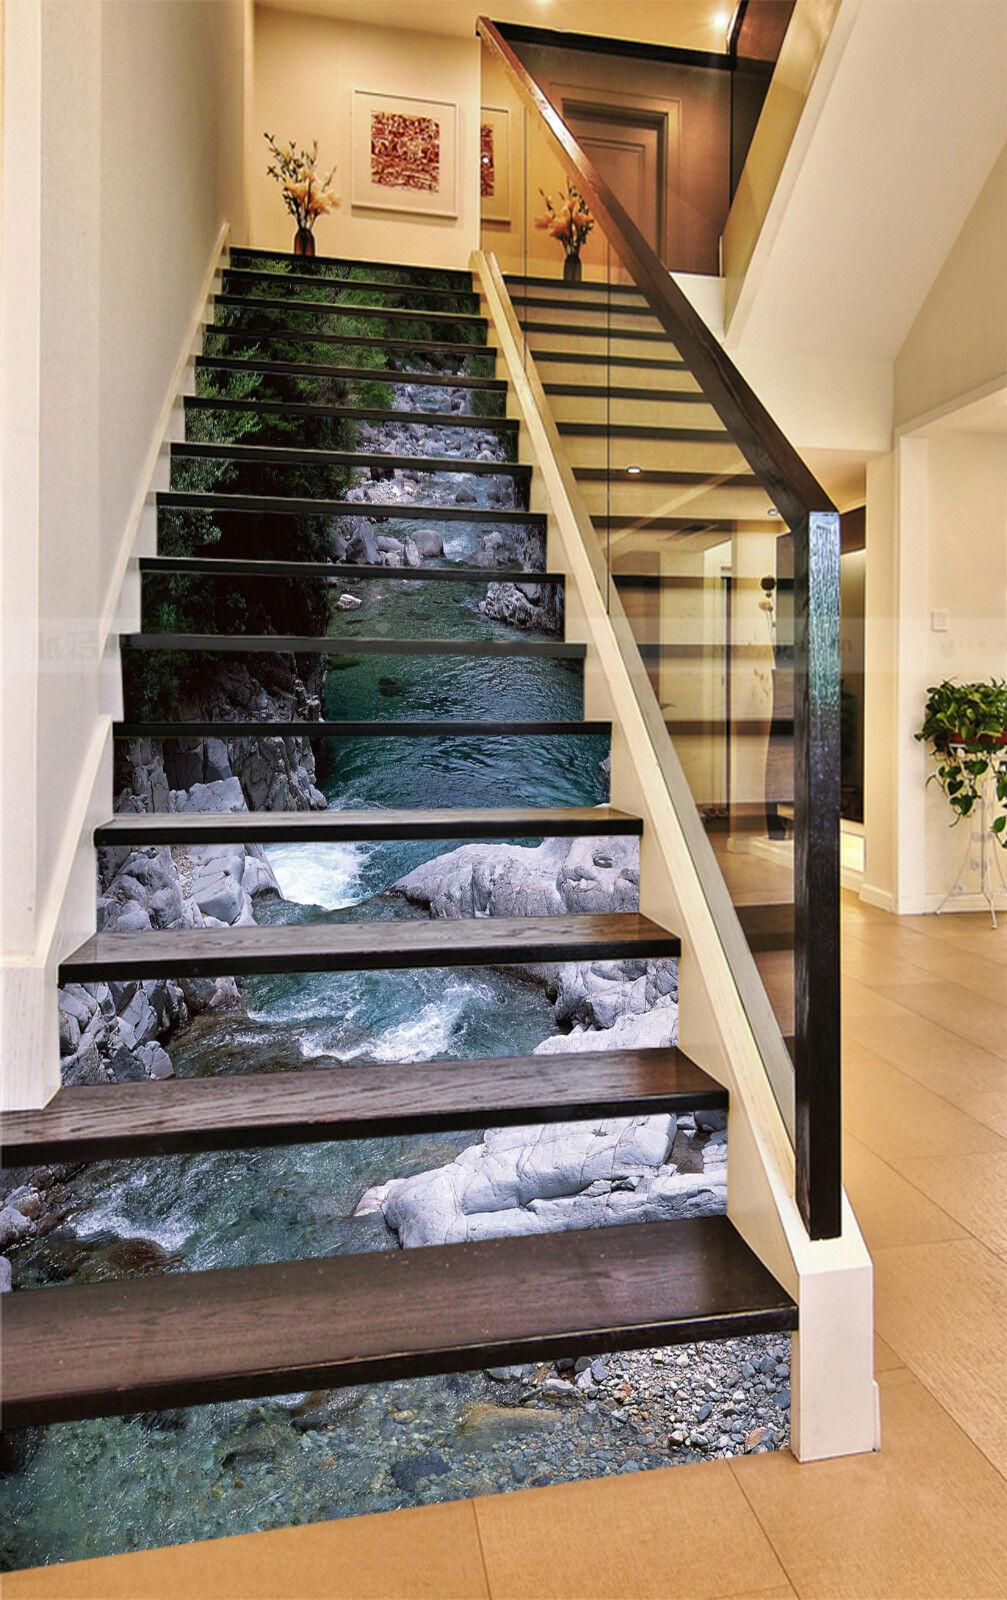 3D Bach Baum 23 Stair Risers Dekoration Fototapete Vinyl Aufkleber Tapete DE